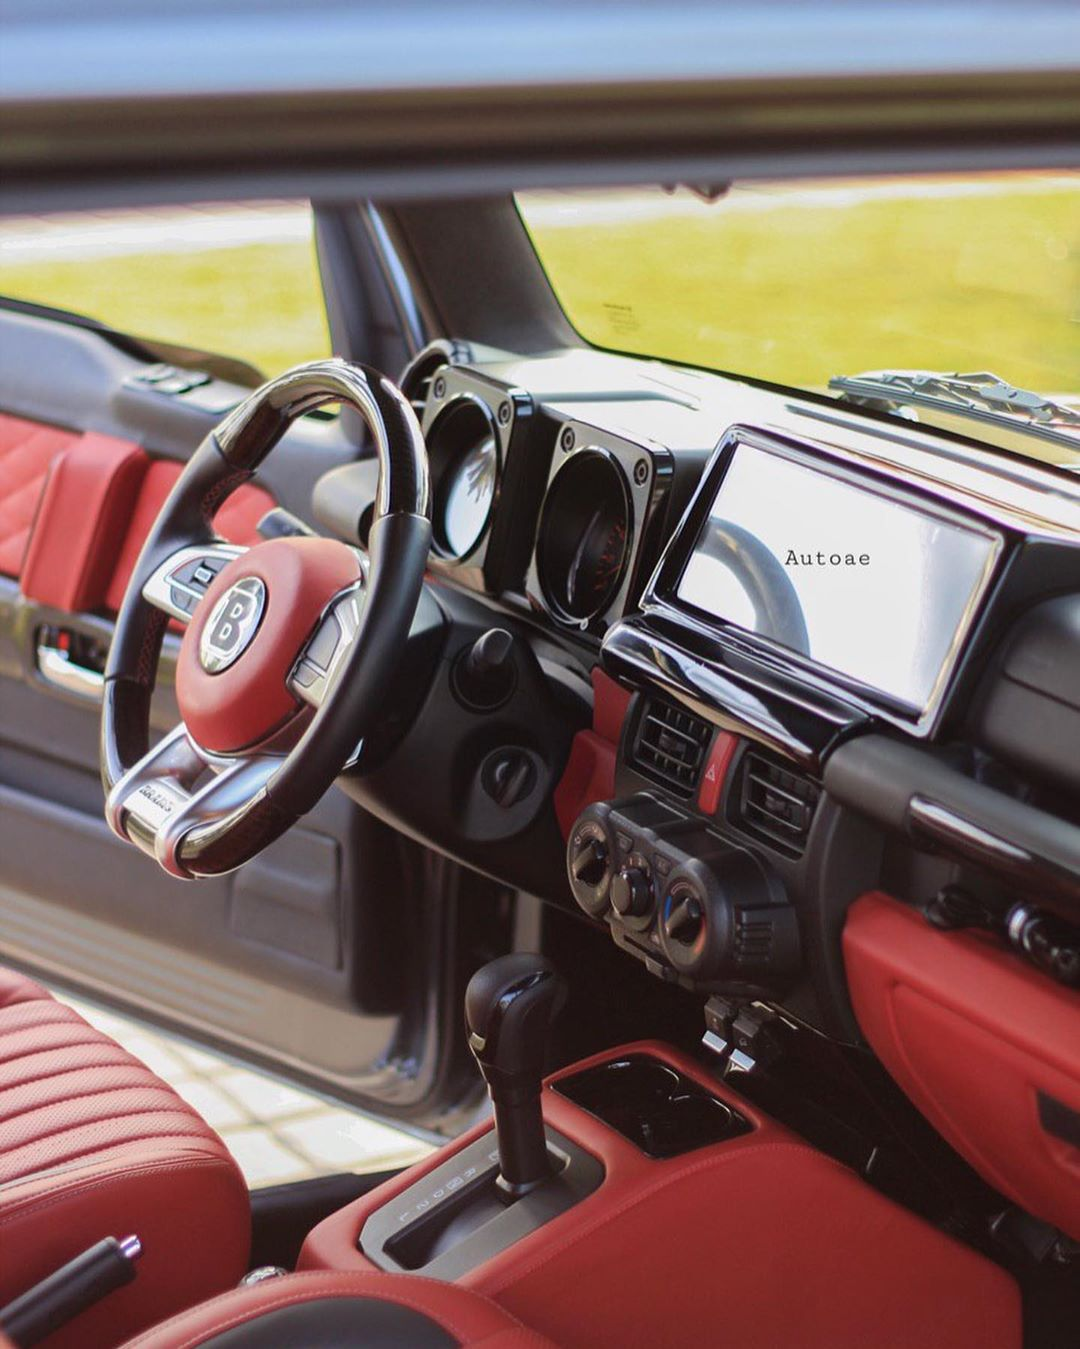 Suzuki Jimny Mercedes-AMG G 63 Brabus